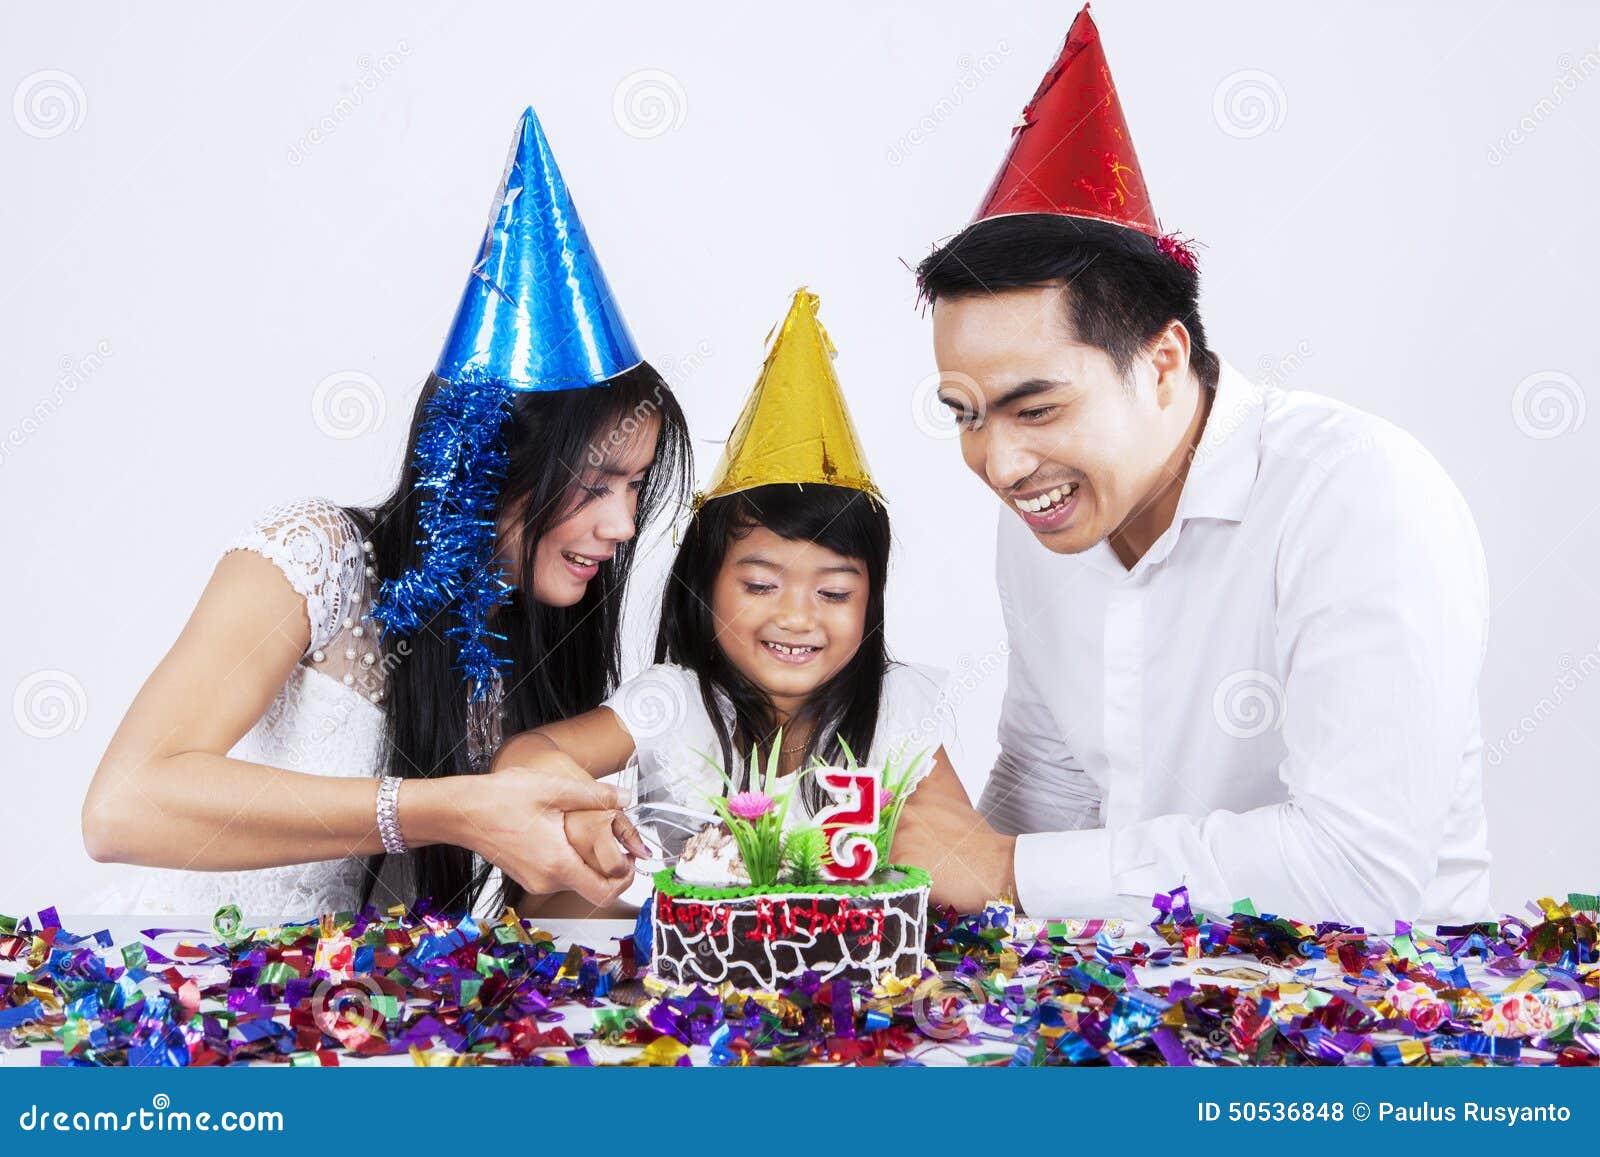 Birthday Cake Cutting Video Download